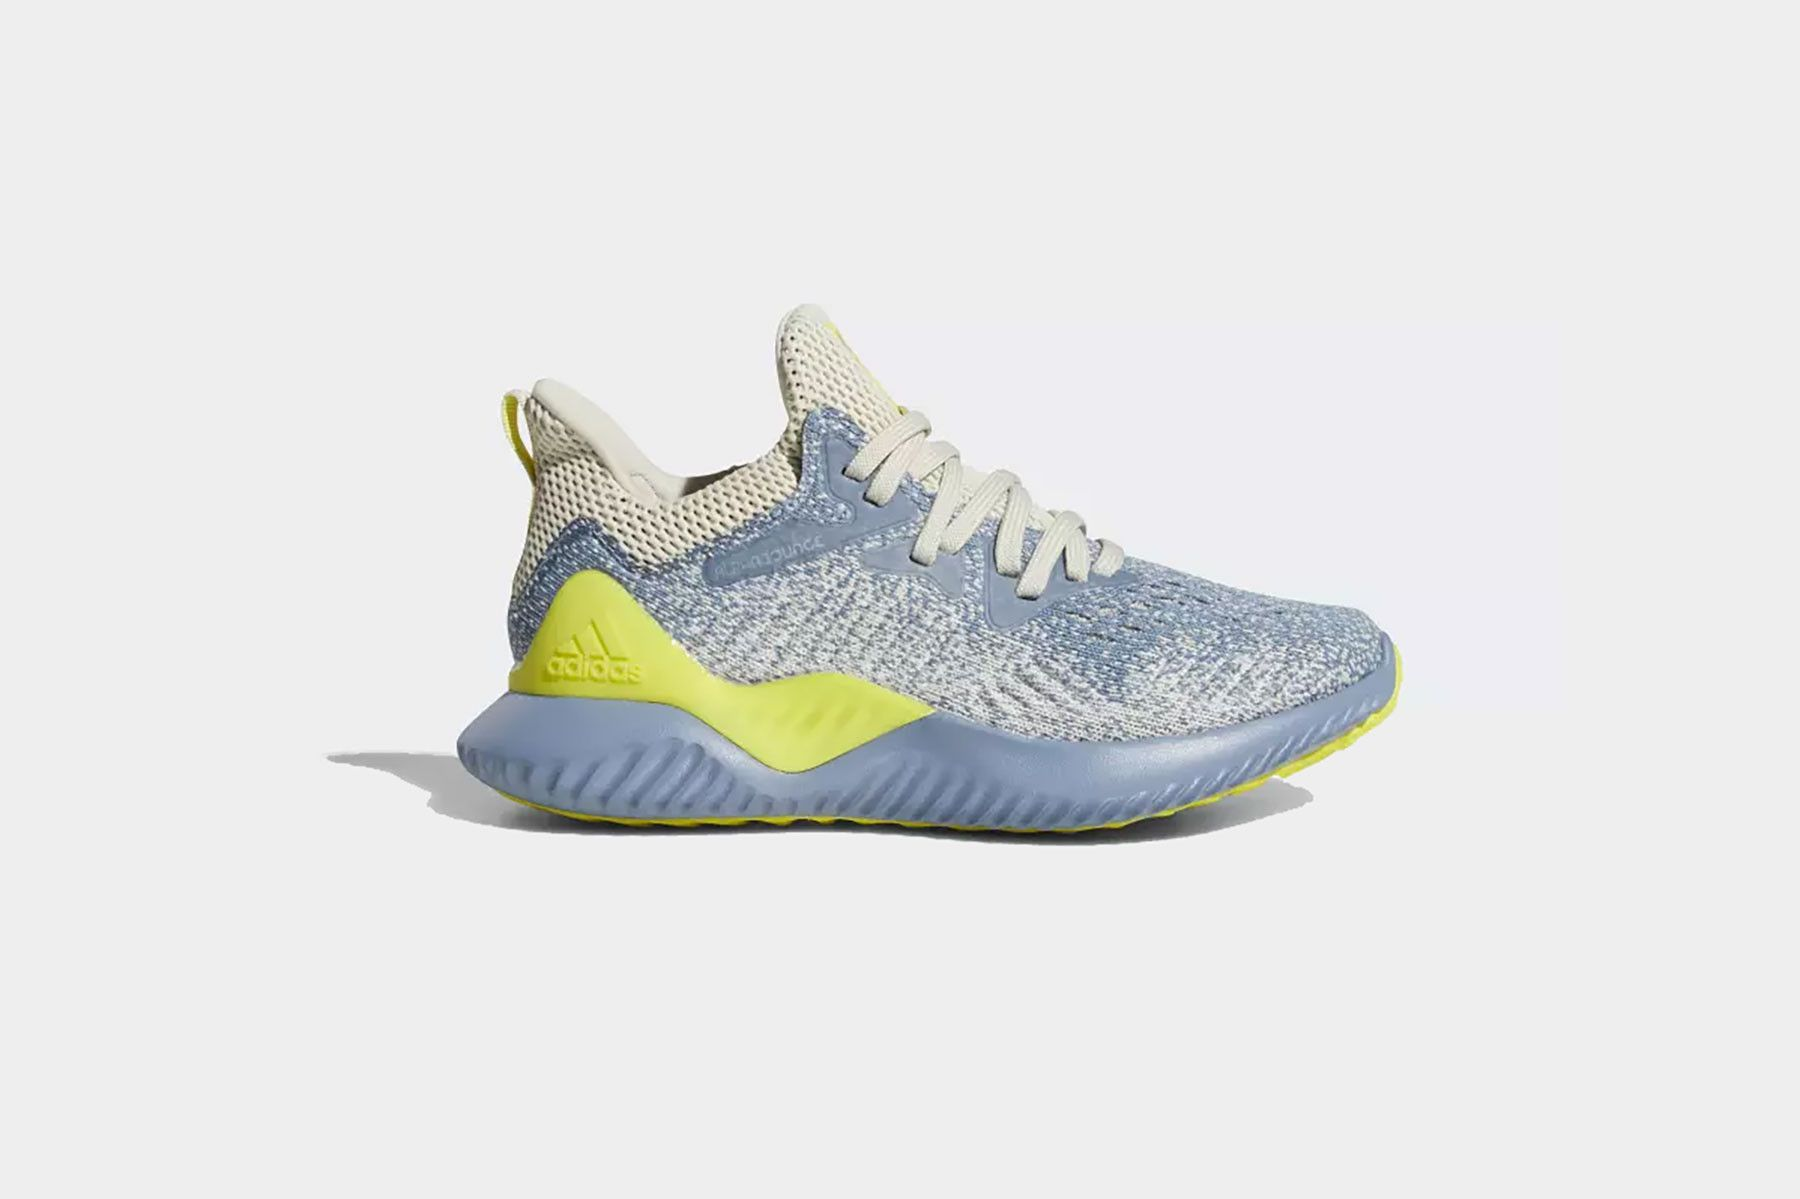 best service dab97 26357 adidas alphabounce running shoes kids blue yellow children steel raw grey  gray shock neon sneakers three stripes originals